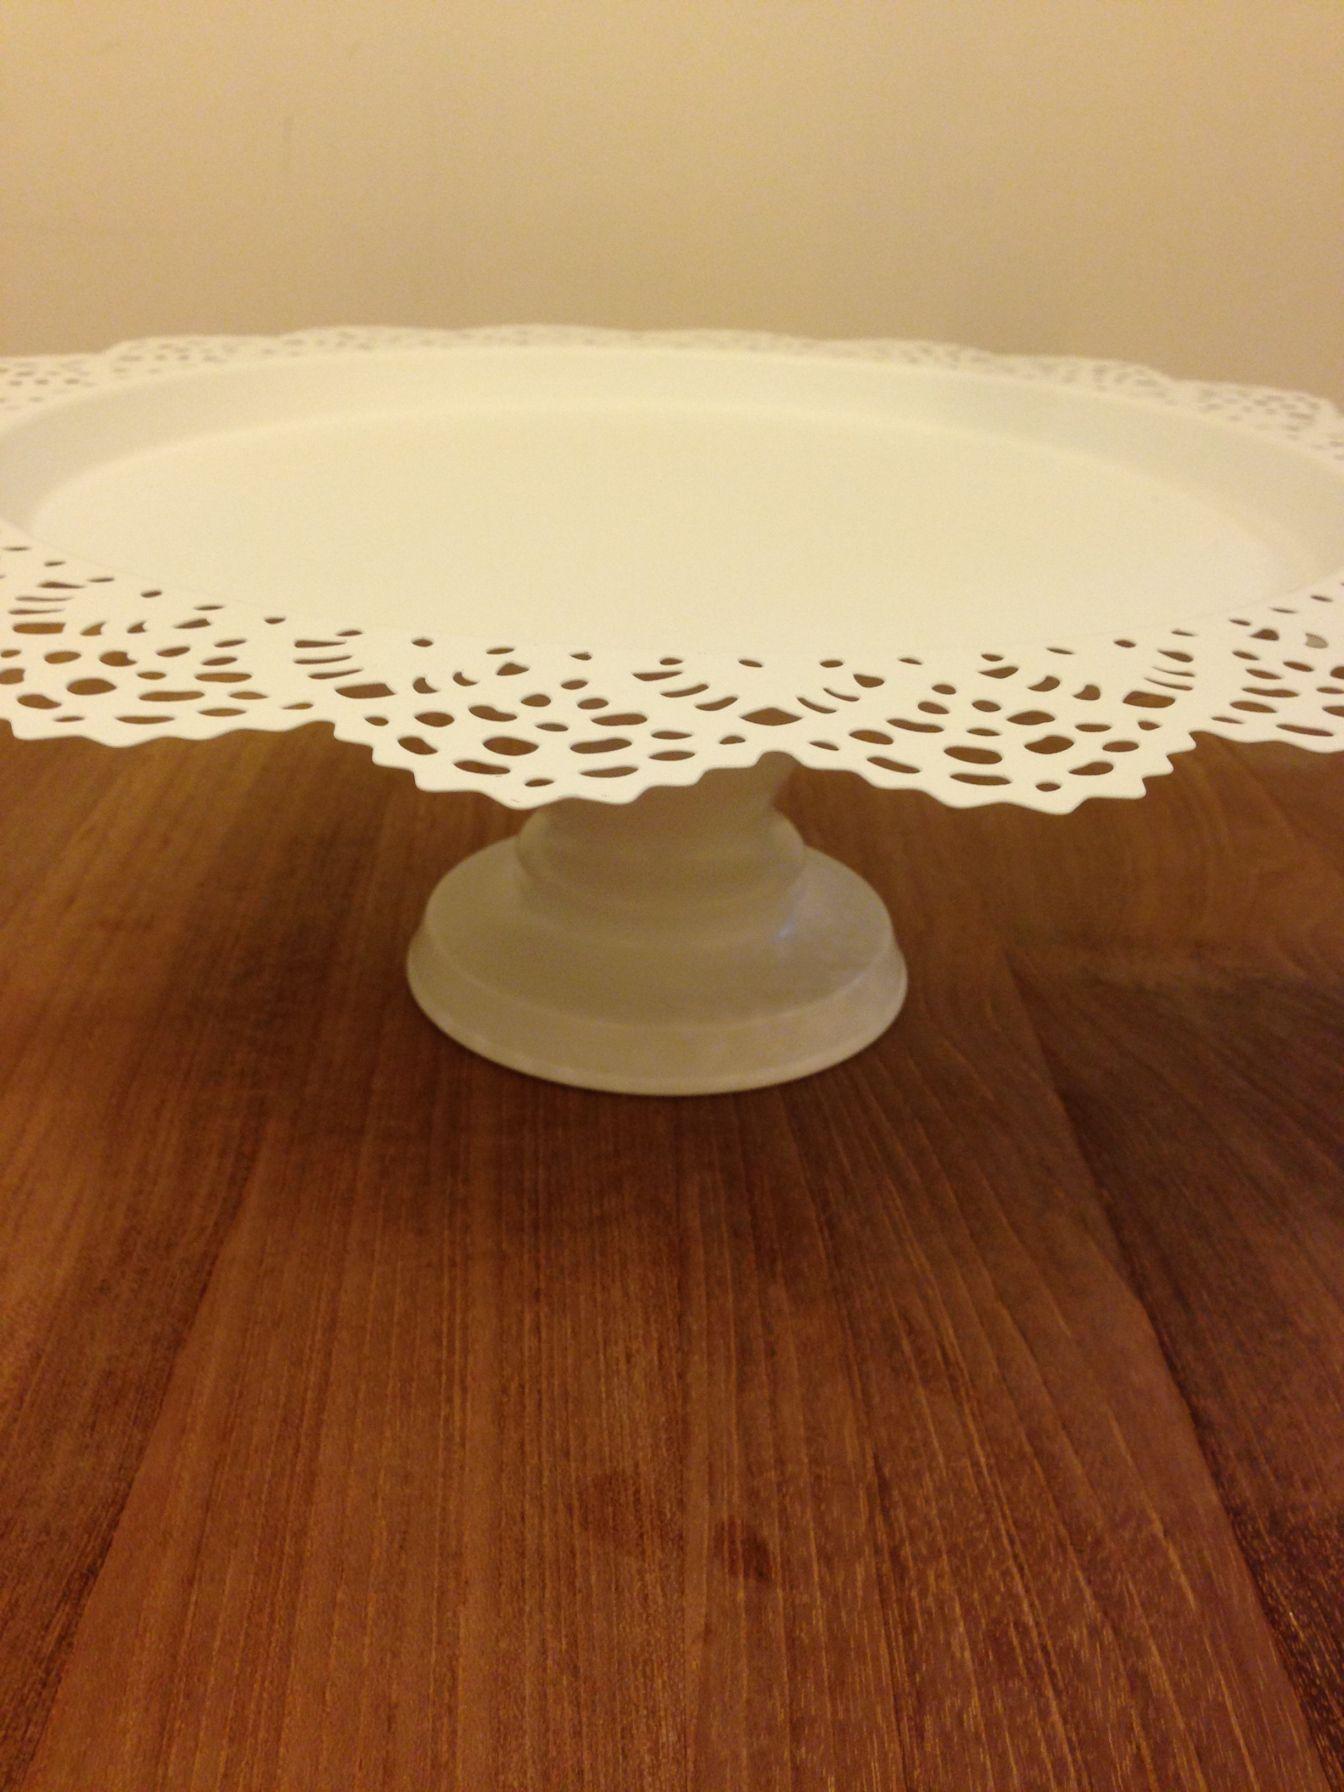 Ikea Skurar DIY cake stand | DIY craft & home decorations ...